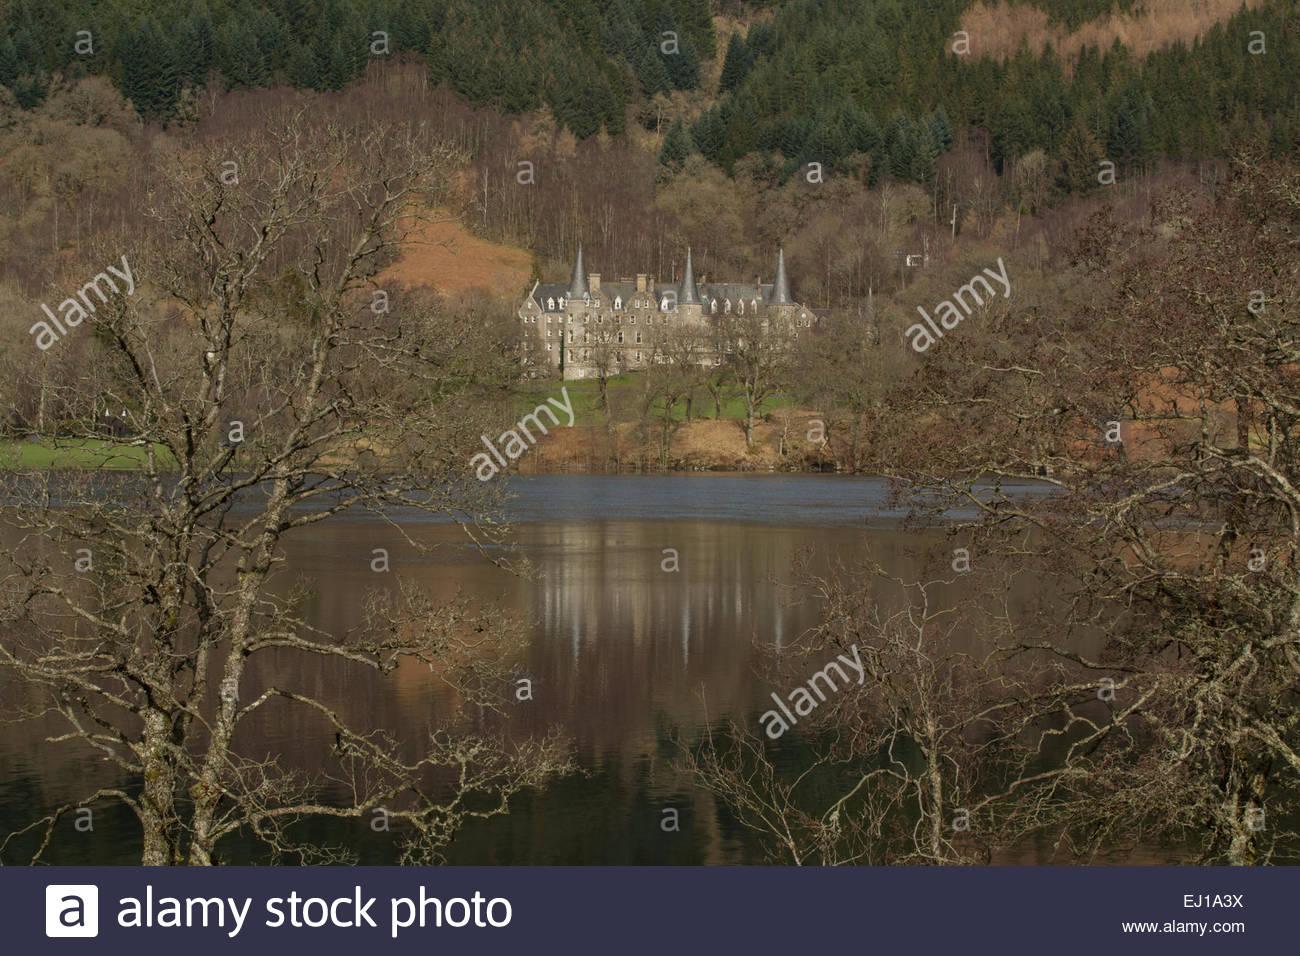 LOCH ACHRAY, LOCH LOMOND & THE TROSSACHS NATIONAL PARK, STIRLINGSHIRE, SCOTLAND, UK: Tigh Mor Trossachs holiday - Stock Image